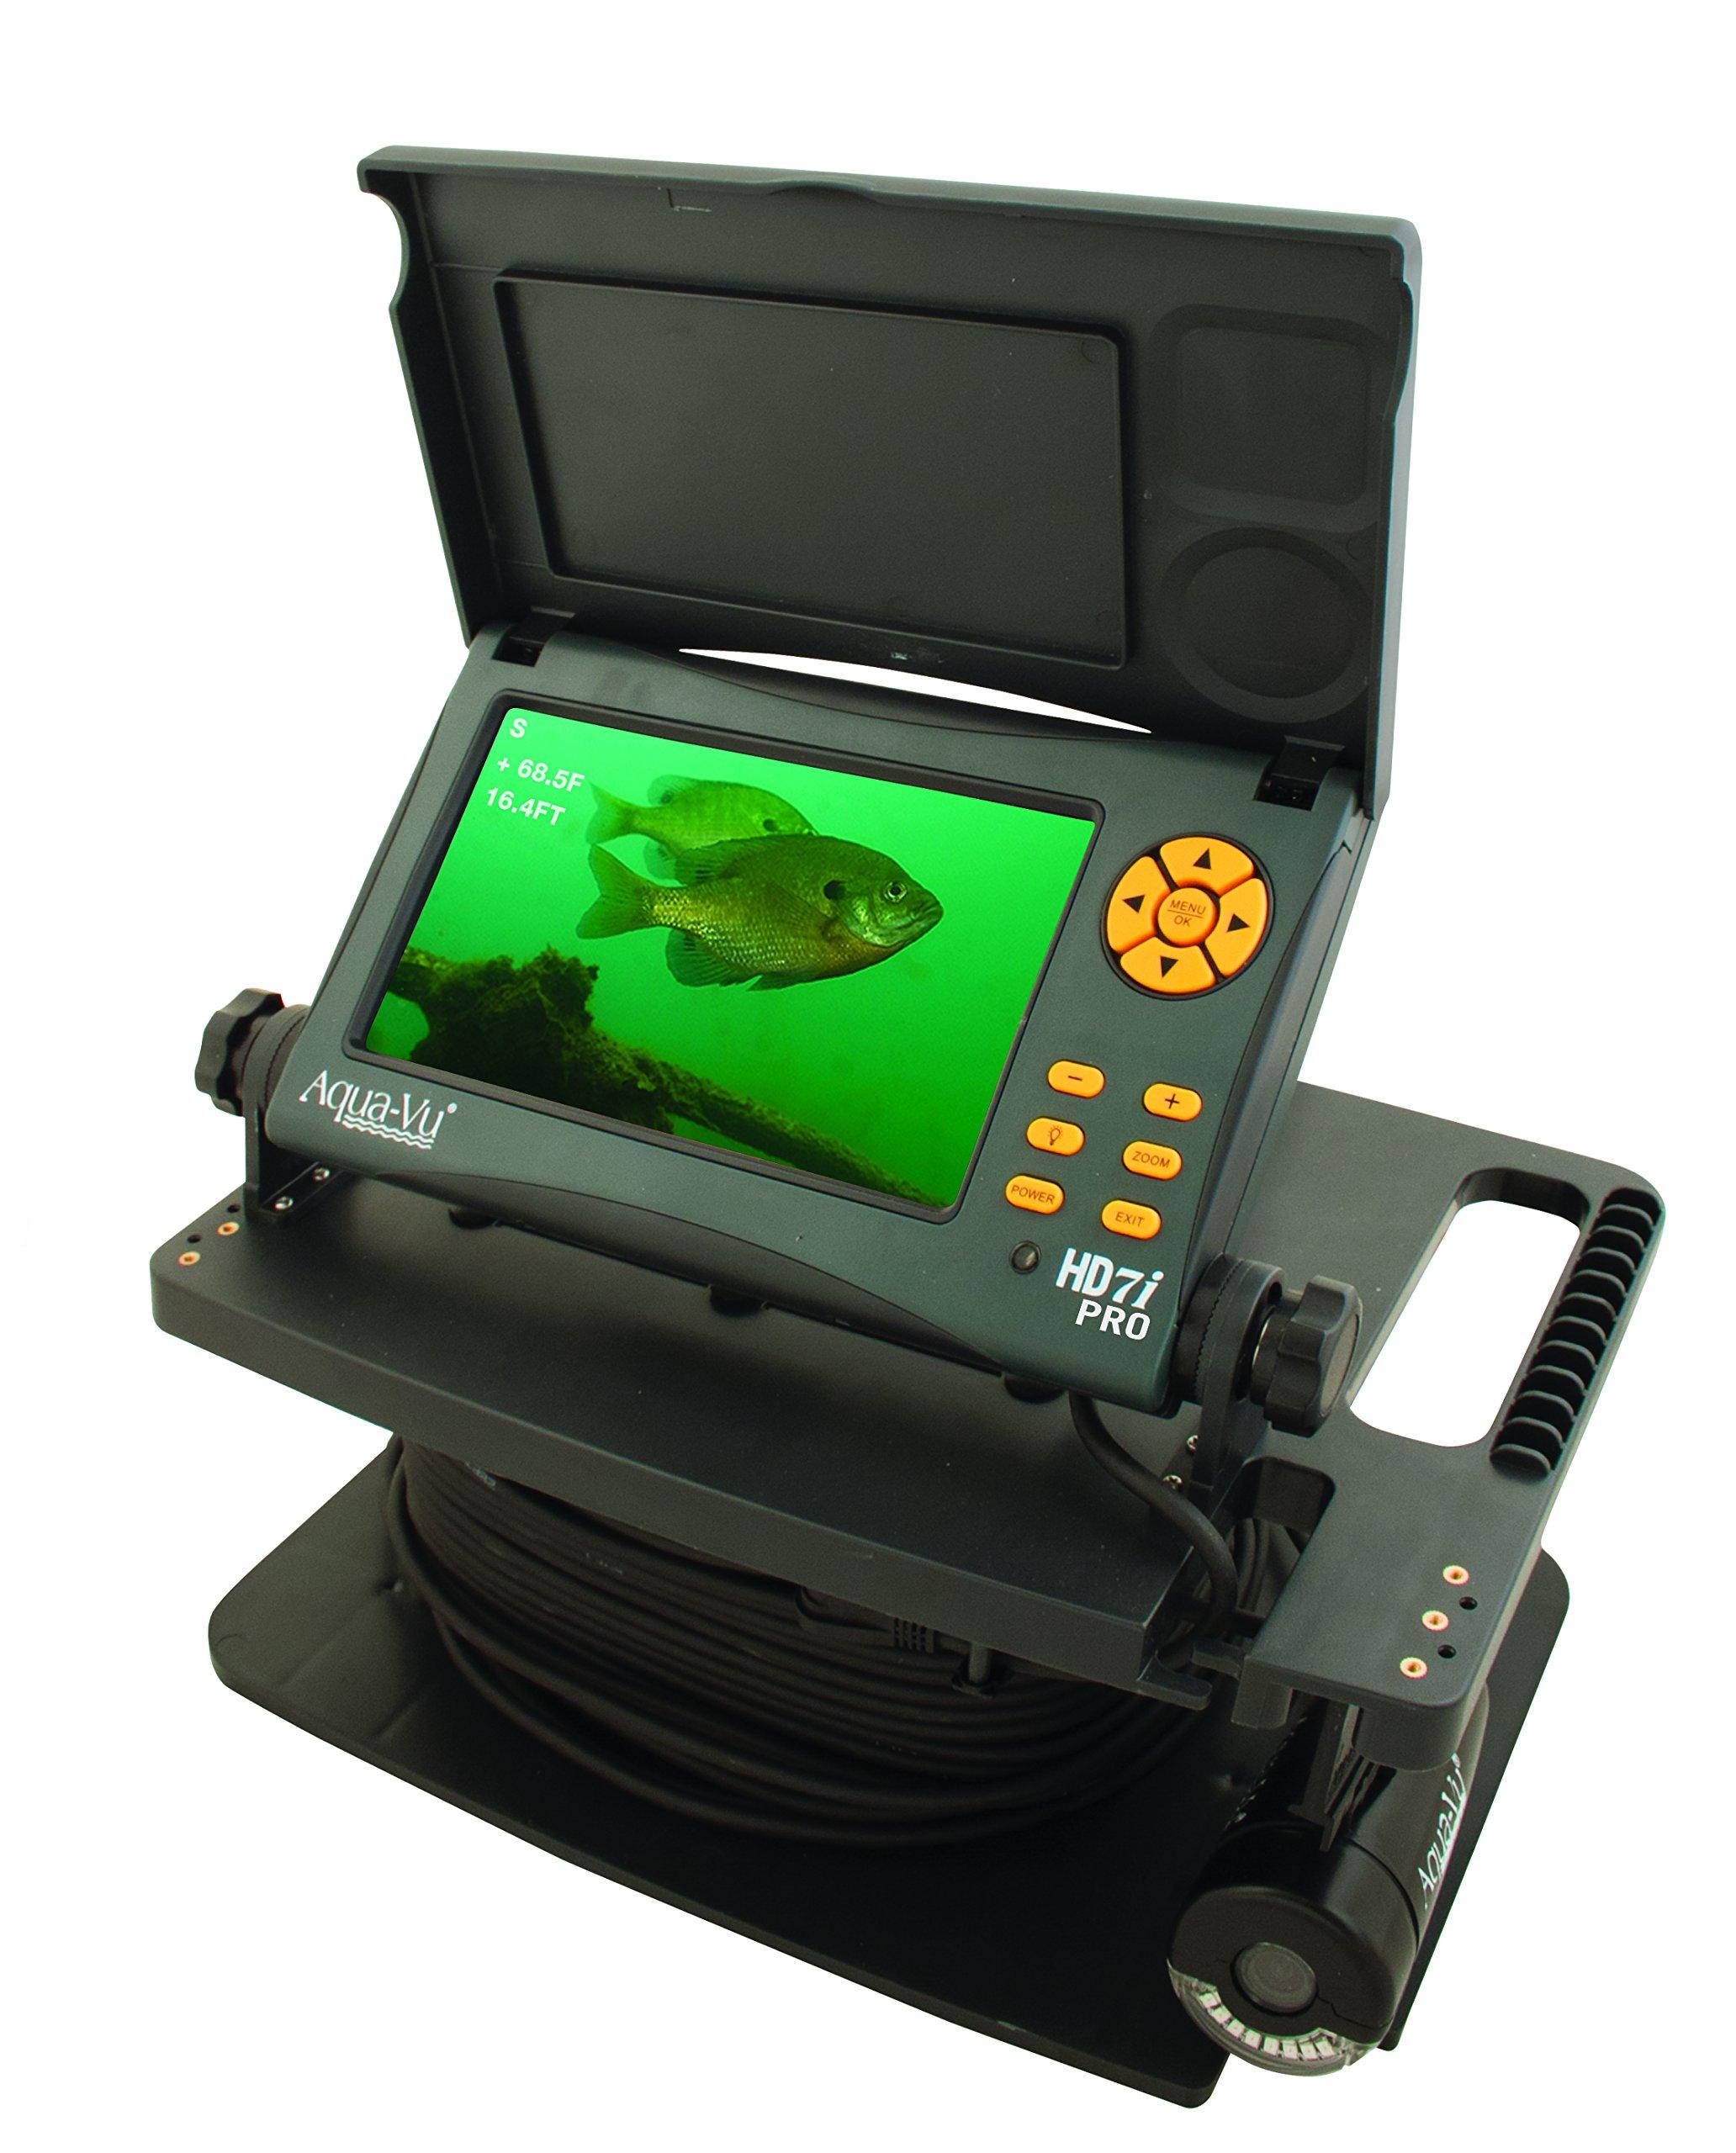 Aqua-Vu HD7i Pro Underwater Camera 7-Inch Color LCD Screen and 75-Feet Cable